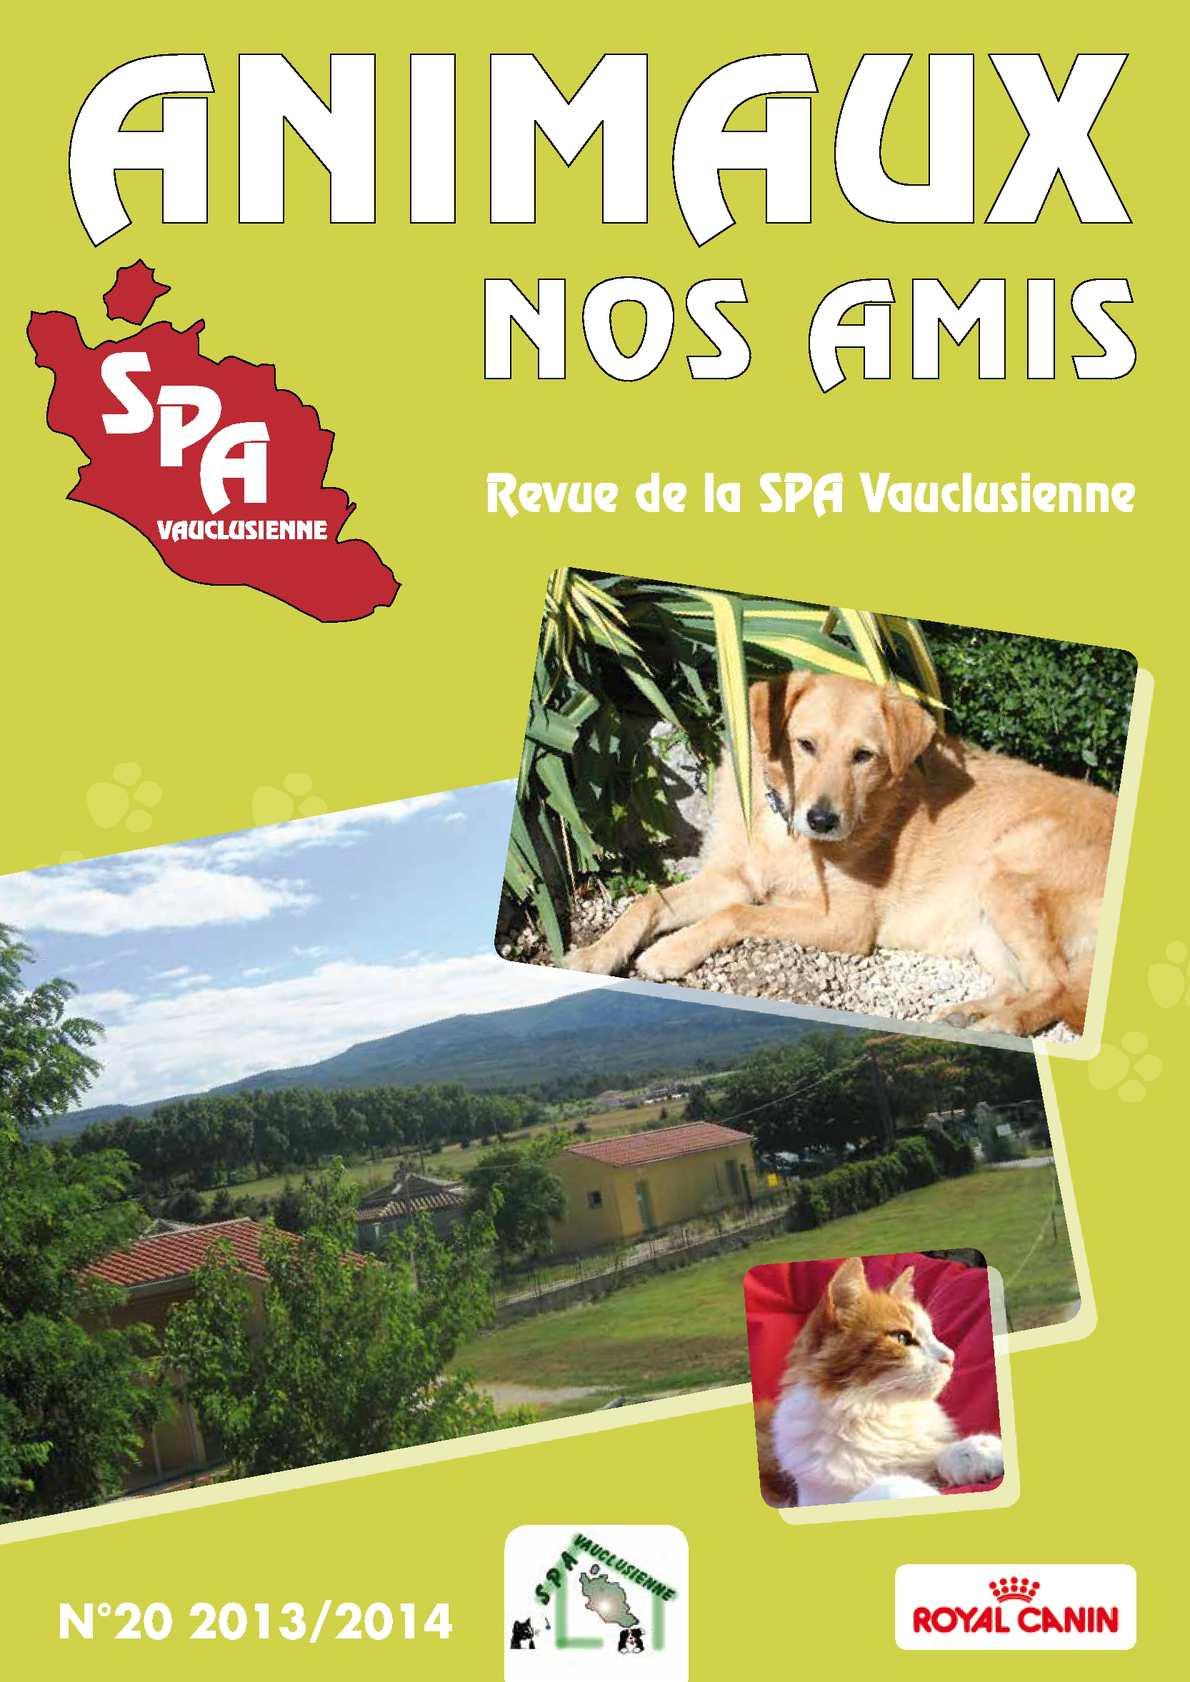 Calam o magazine animaux nos amis n 20 spa vauclusienne - Salon animaux avignon ...